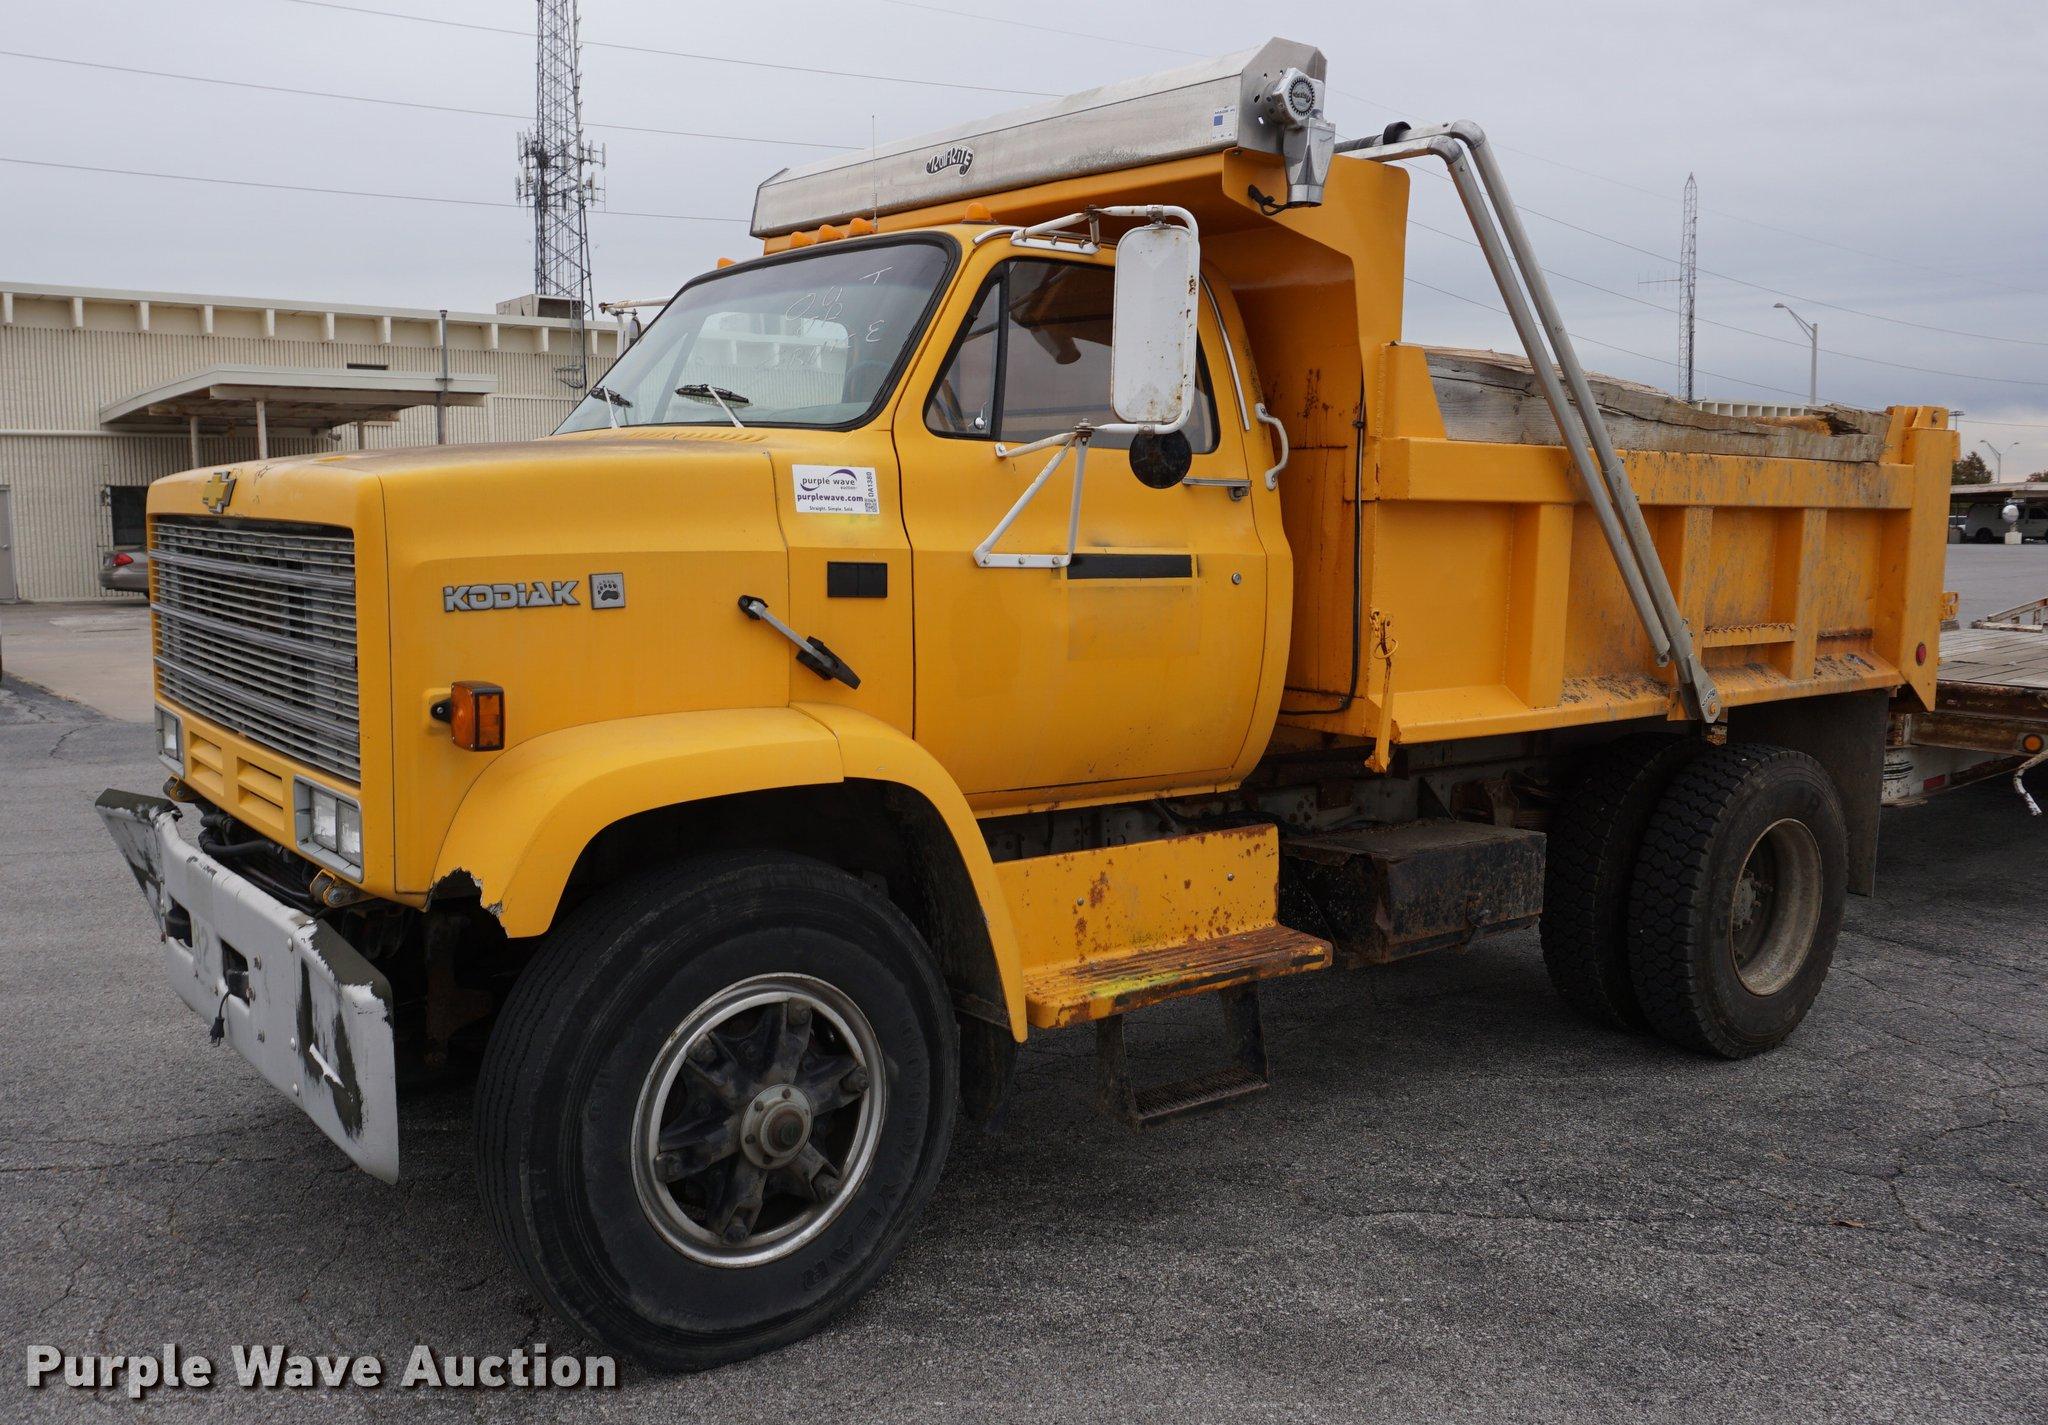 1989 Chevrolet Kodiak dump truck | Item DA1380 | SOLD! Decem